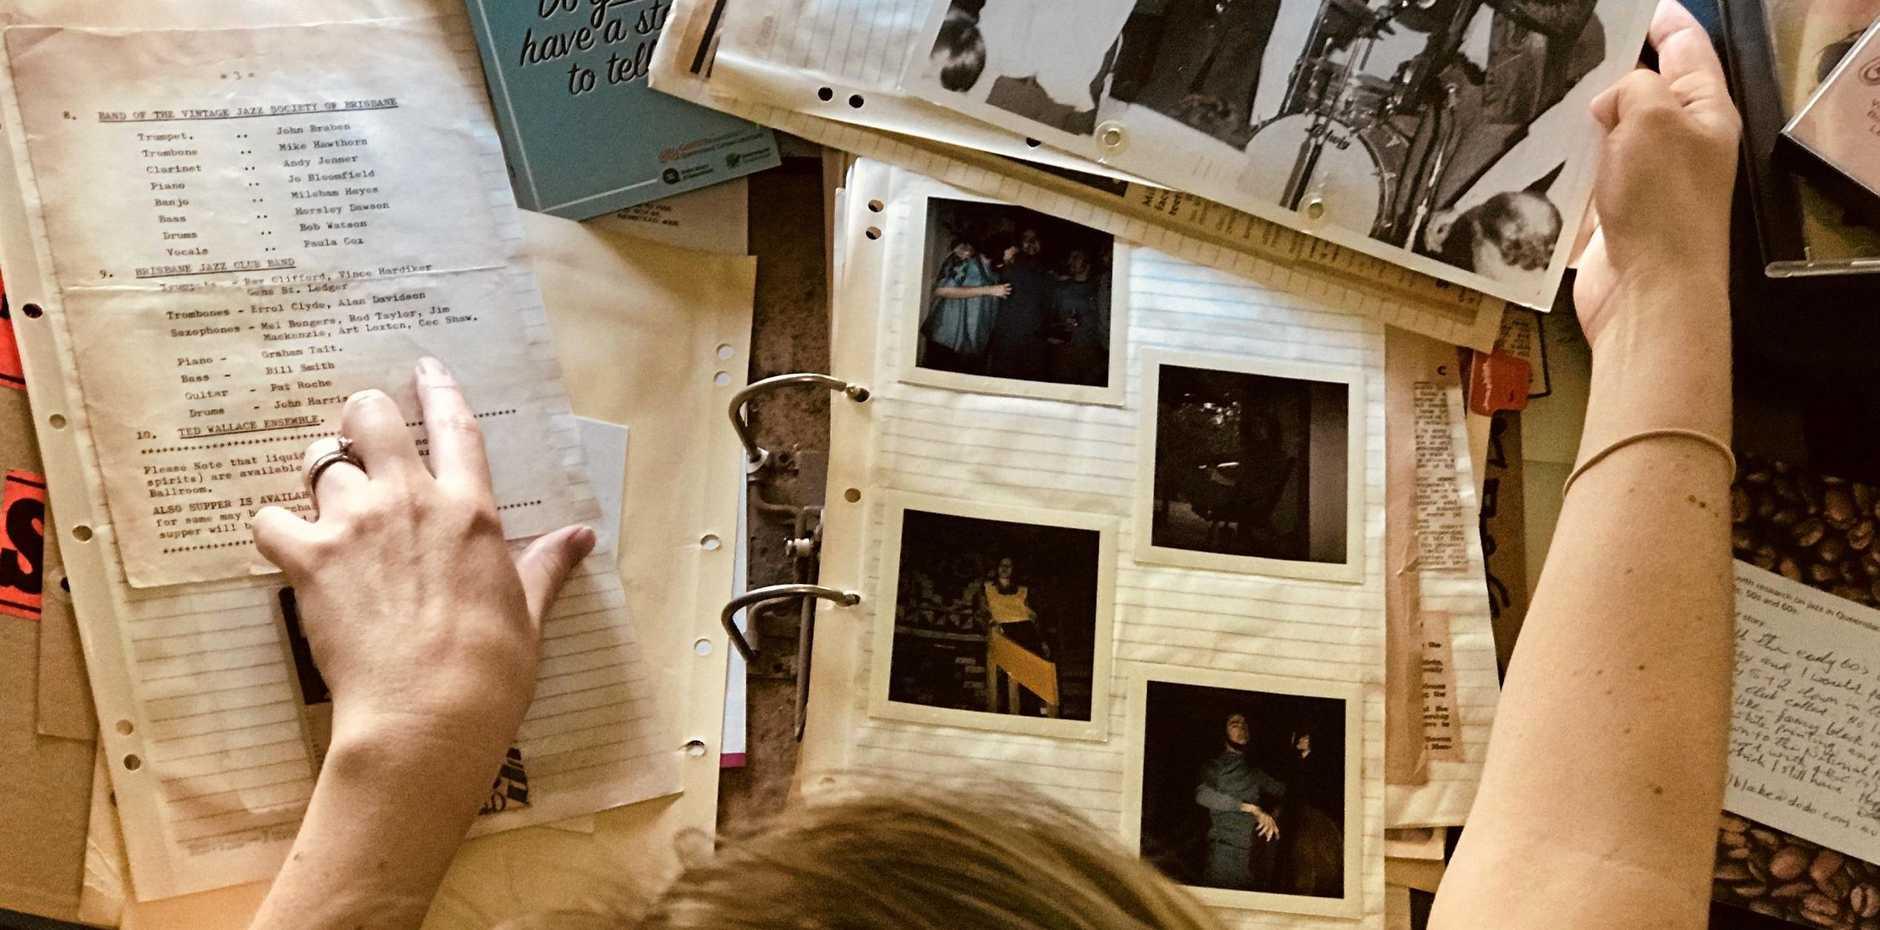 ALL THAT JAZZ: Dr Lauren Istvandity looks over a scrapbook of heritage materials from the 1970s.